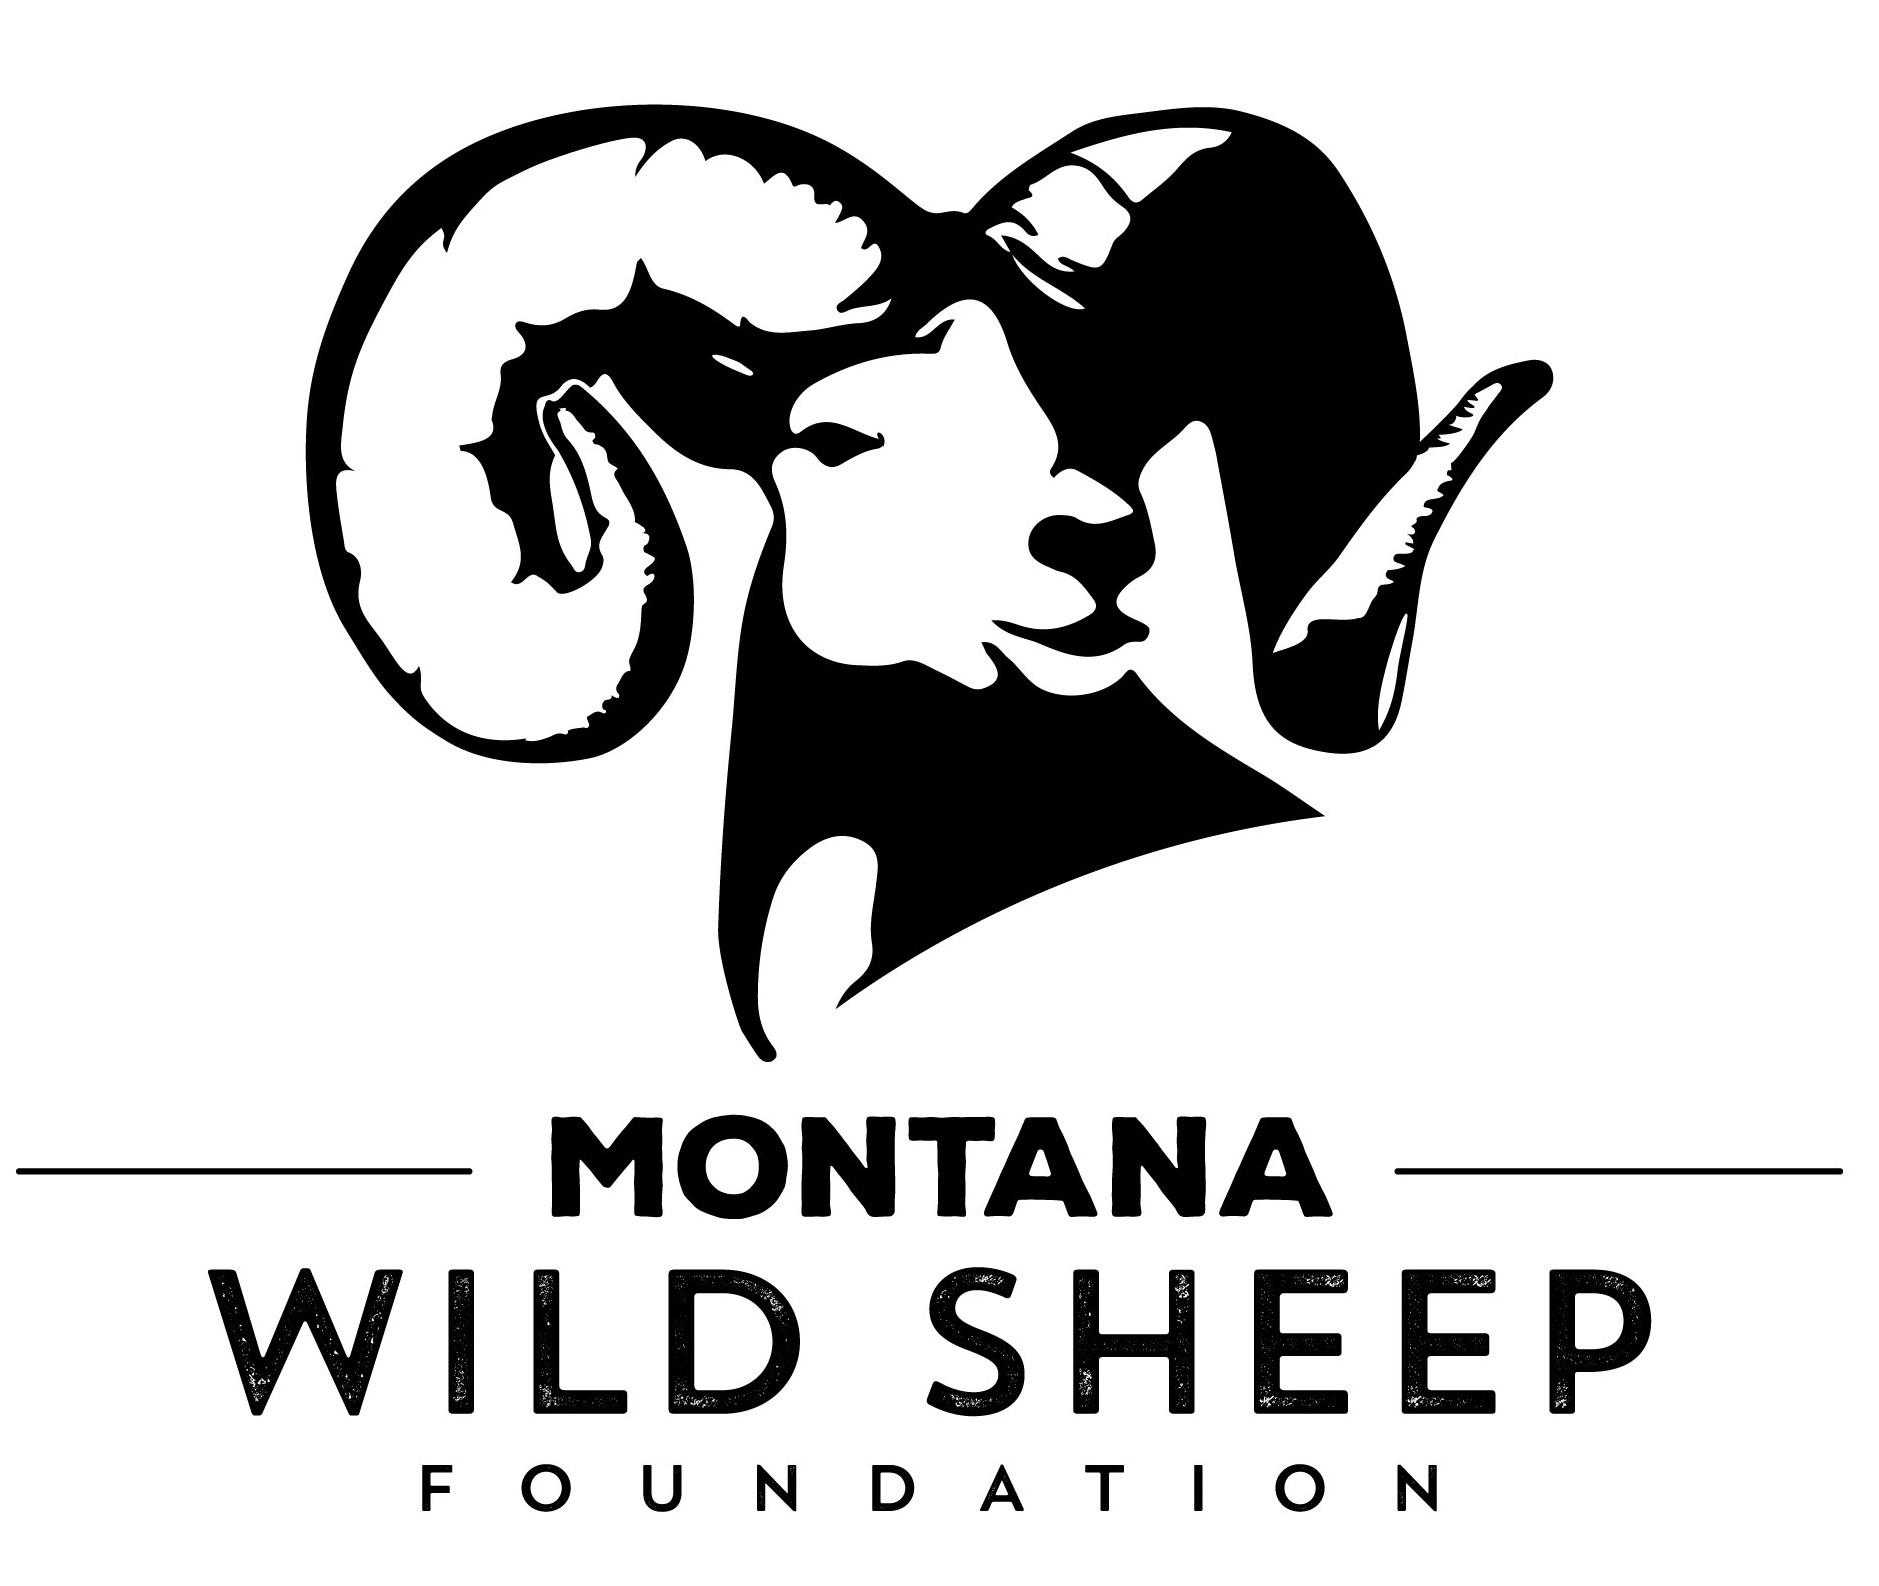 Wild Sheep Foundation